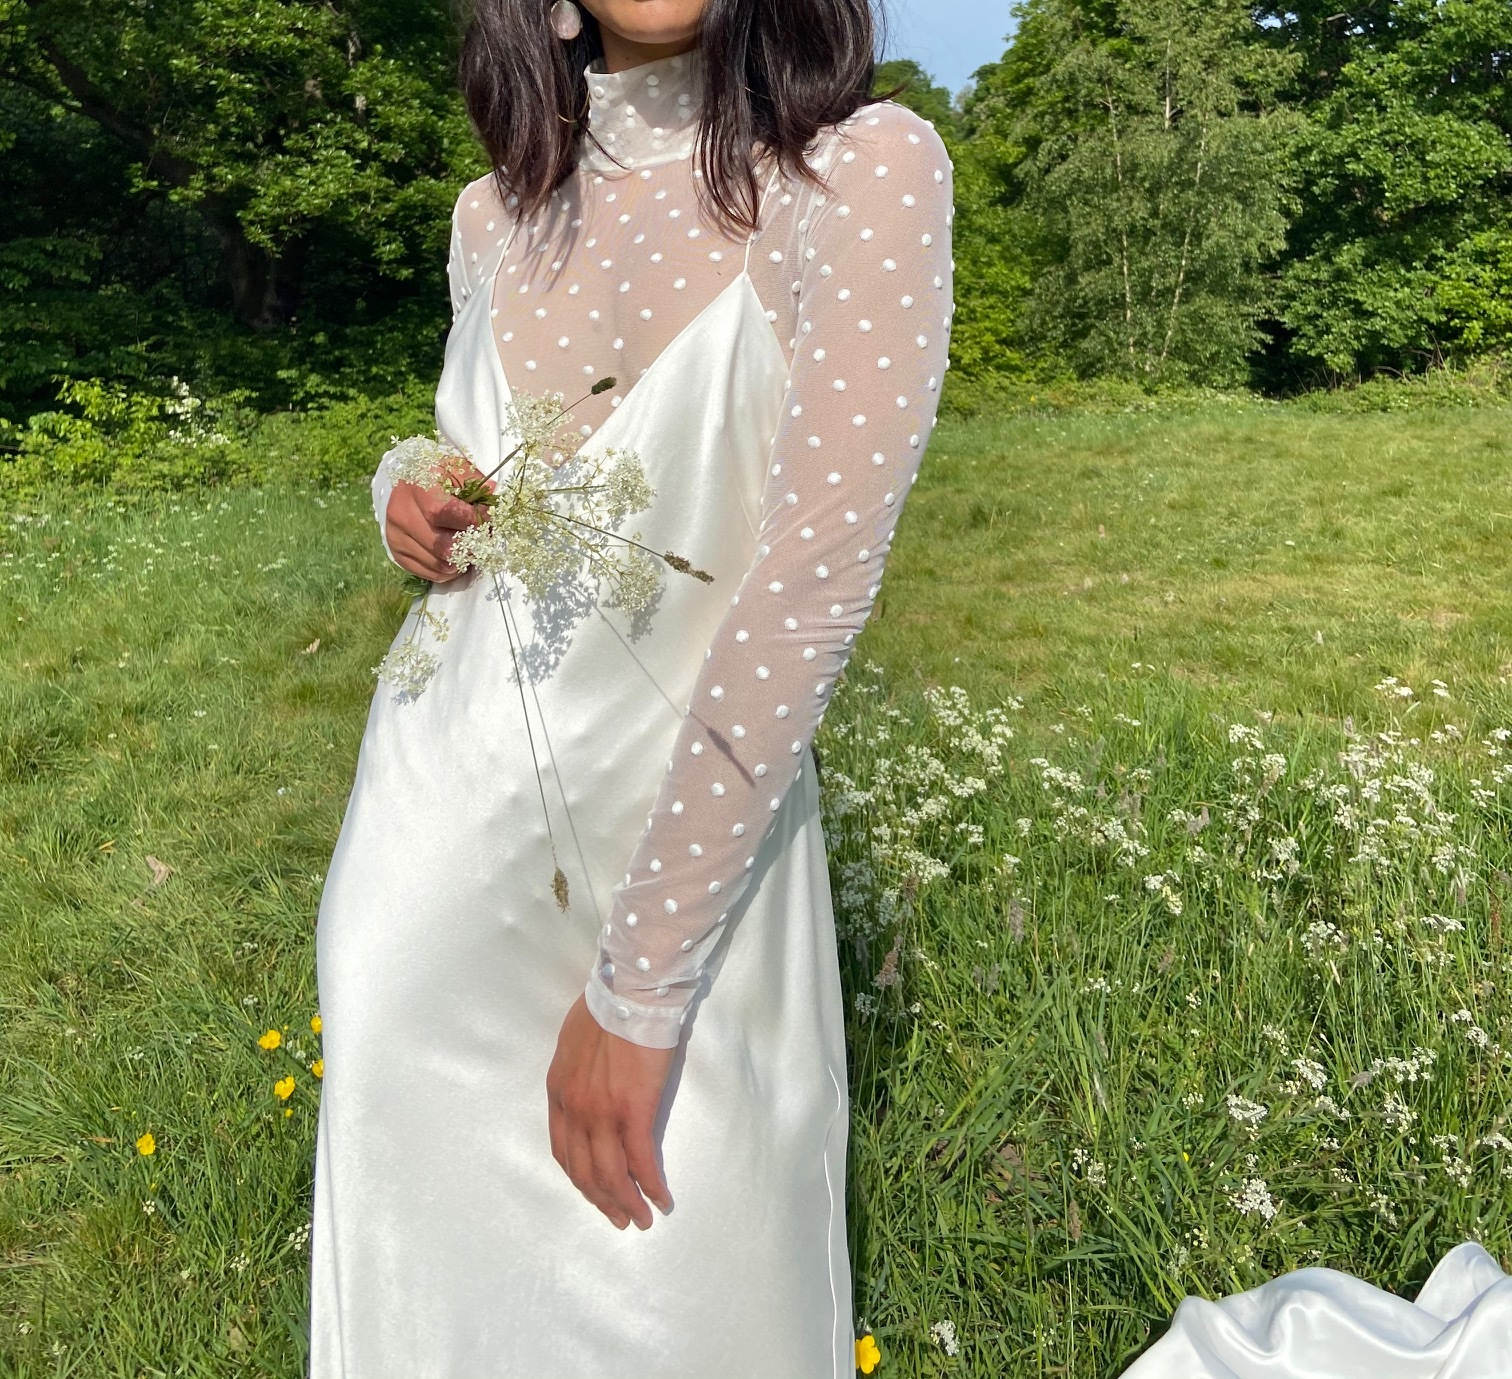 marcello bodysuit  dress photo